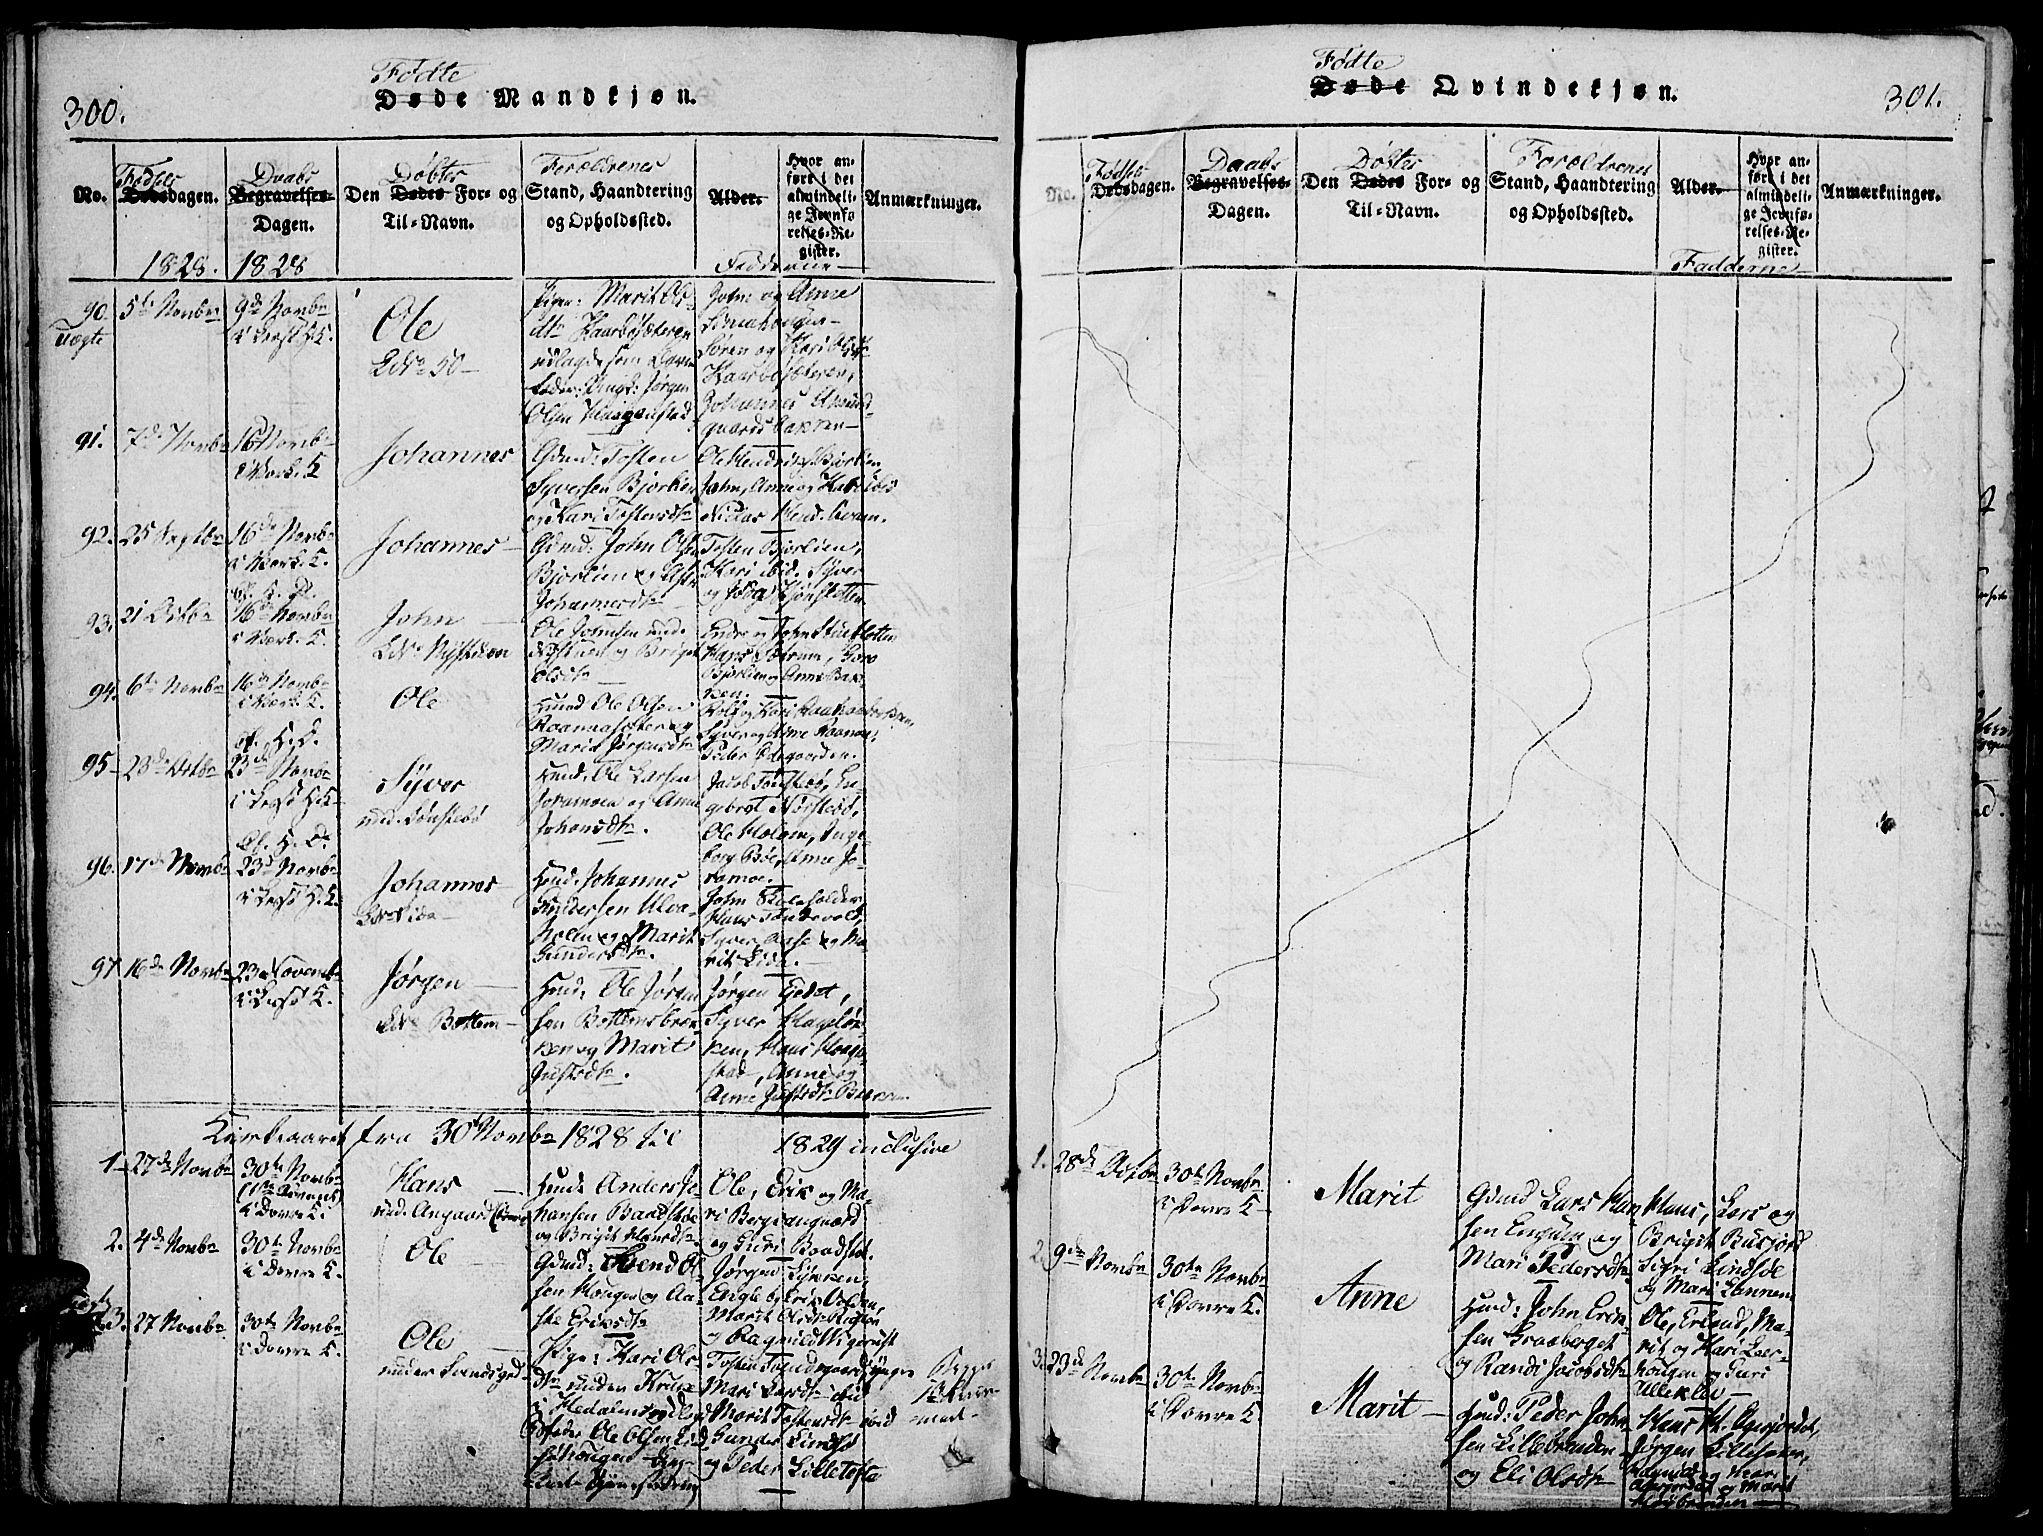 SAH, Lesja prestekontor, Ministerialbok nr. 4, 1820-1829, s. 300-301